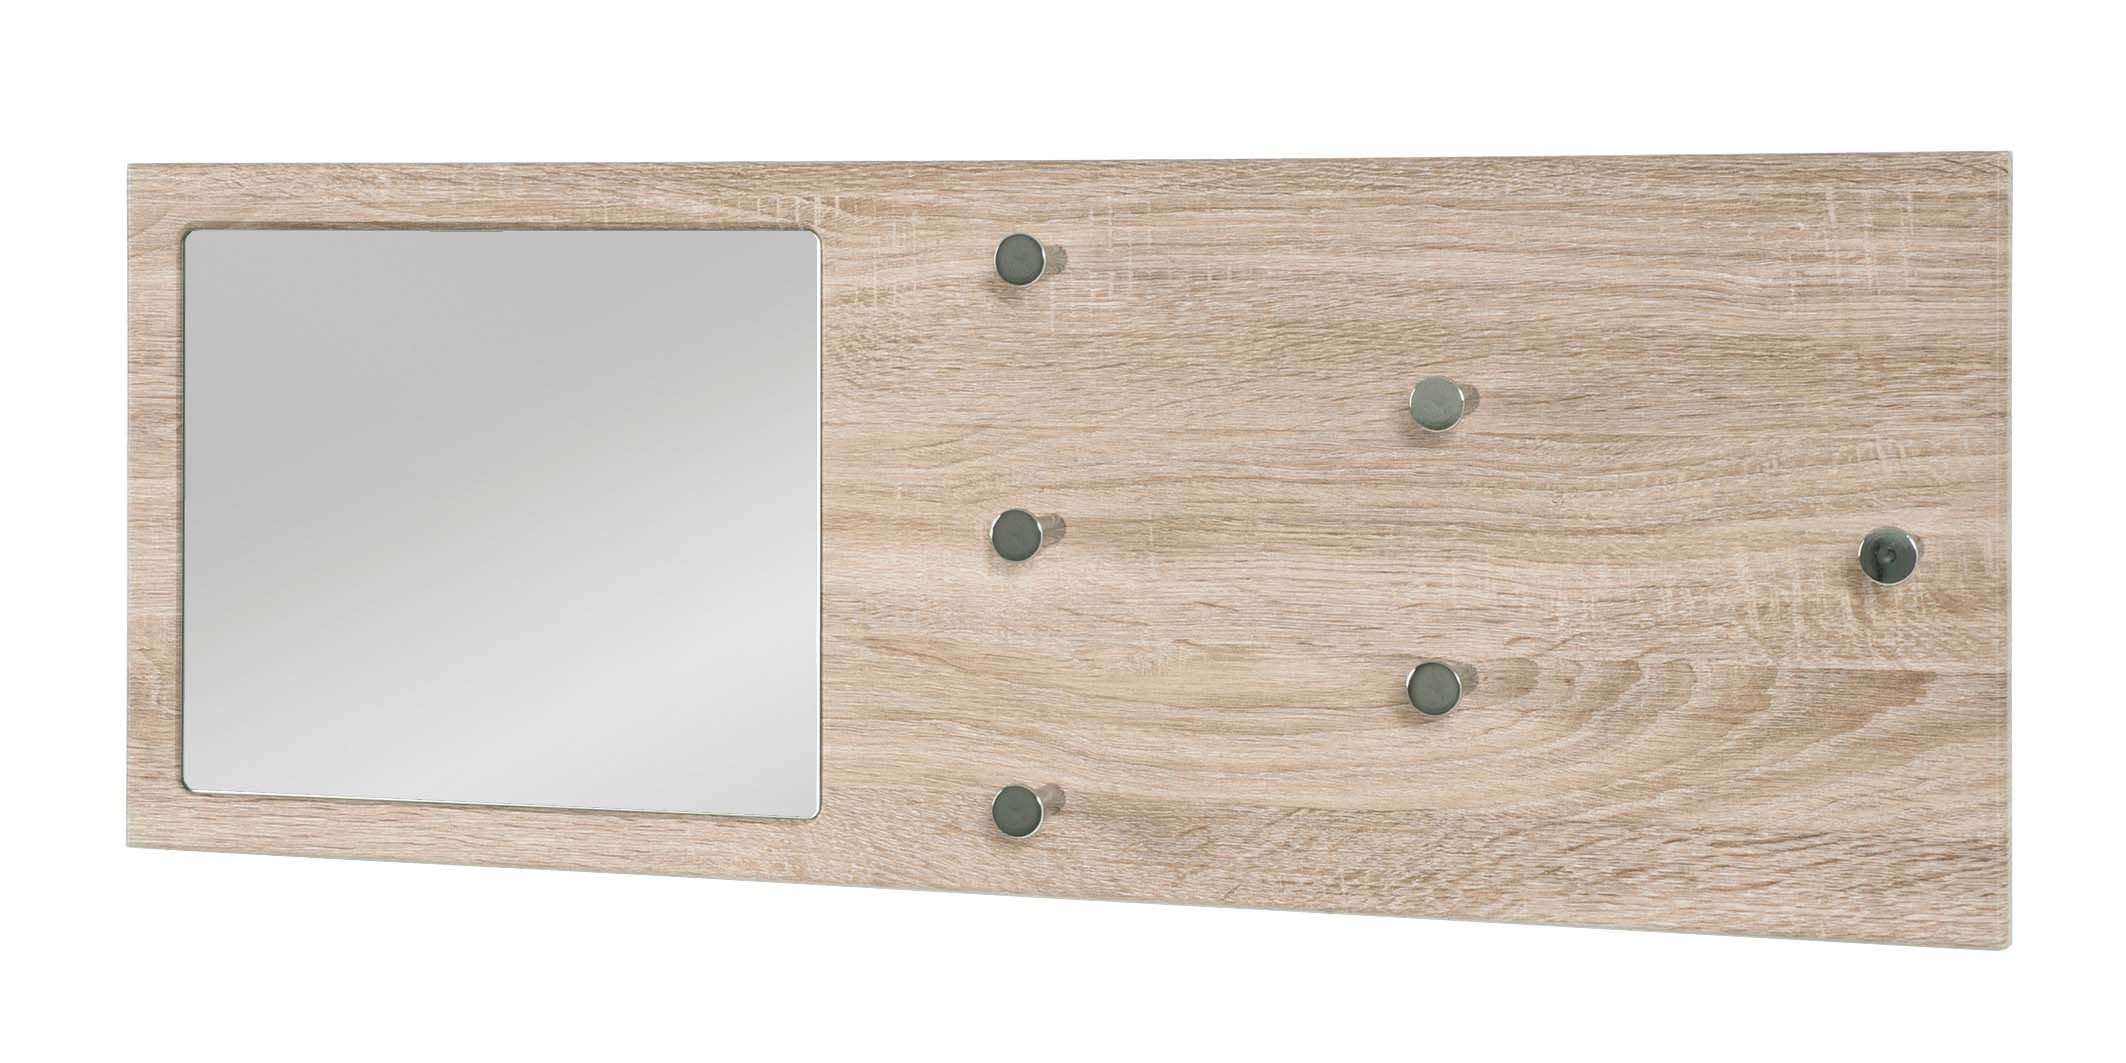 wandgarderobe garderobenpaneel garderobe mit spiegel h nge. Black Bedroom Furniture Sets. Home Design Ideas